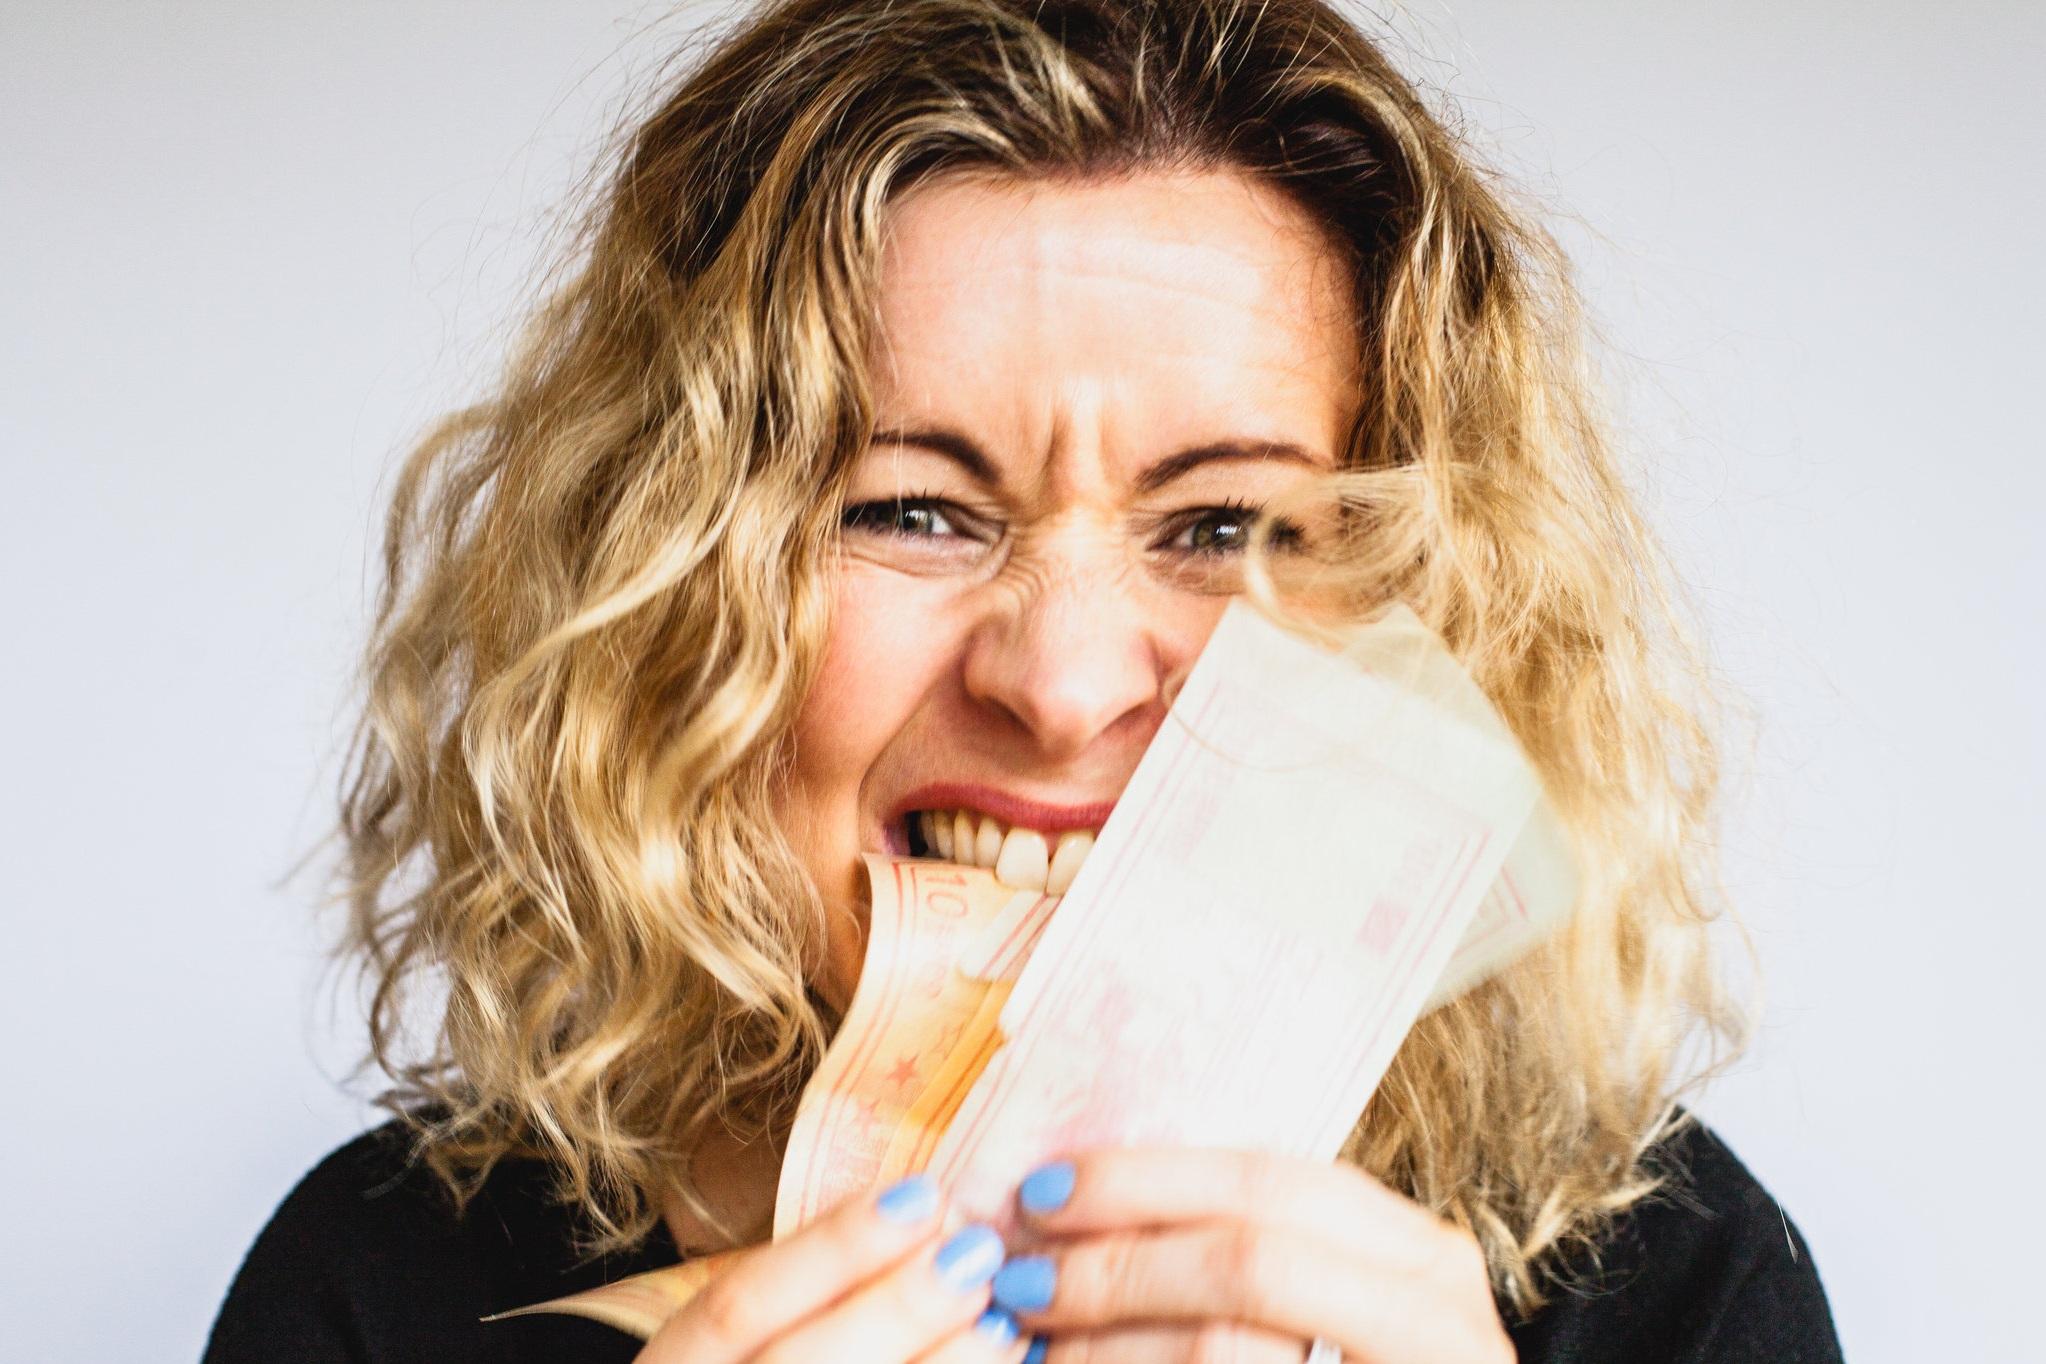 woman holding a few bills